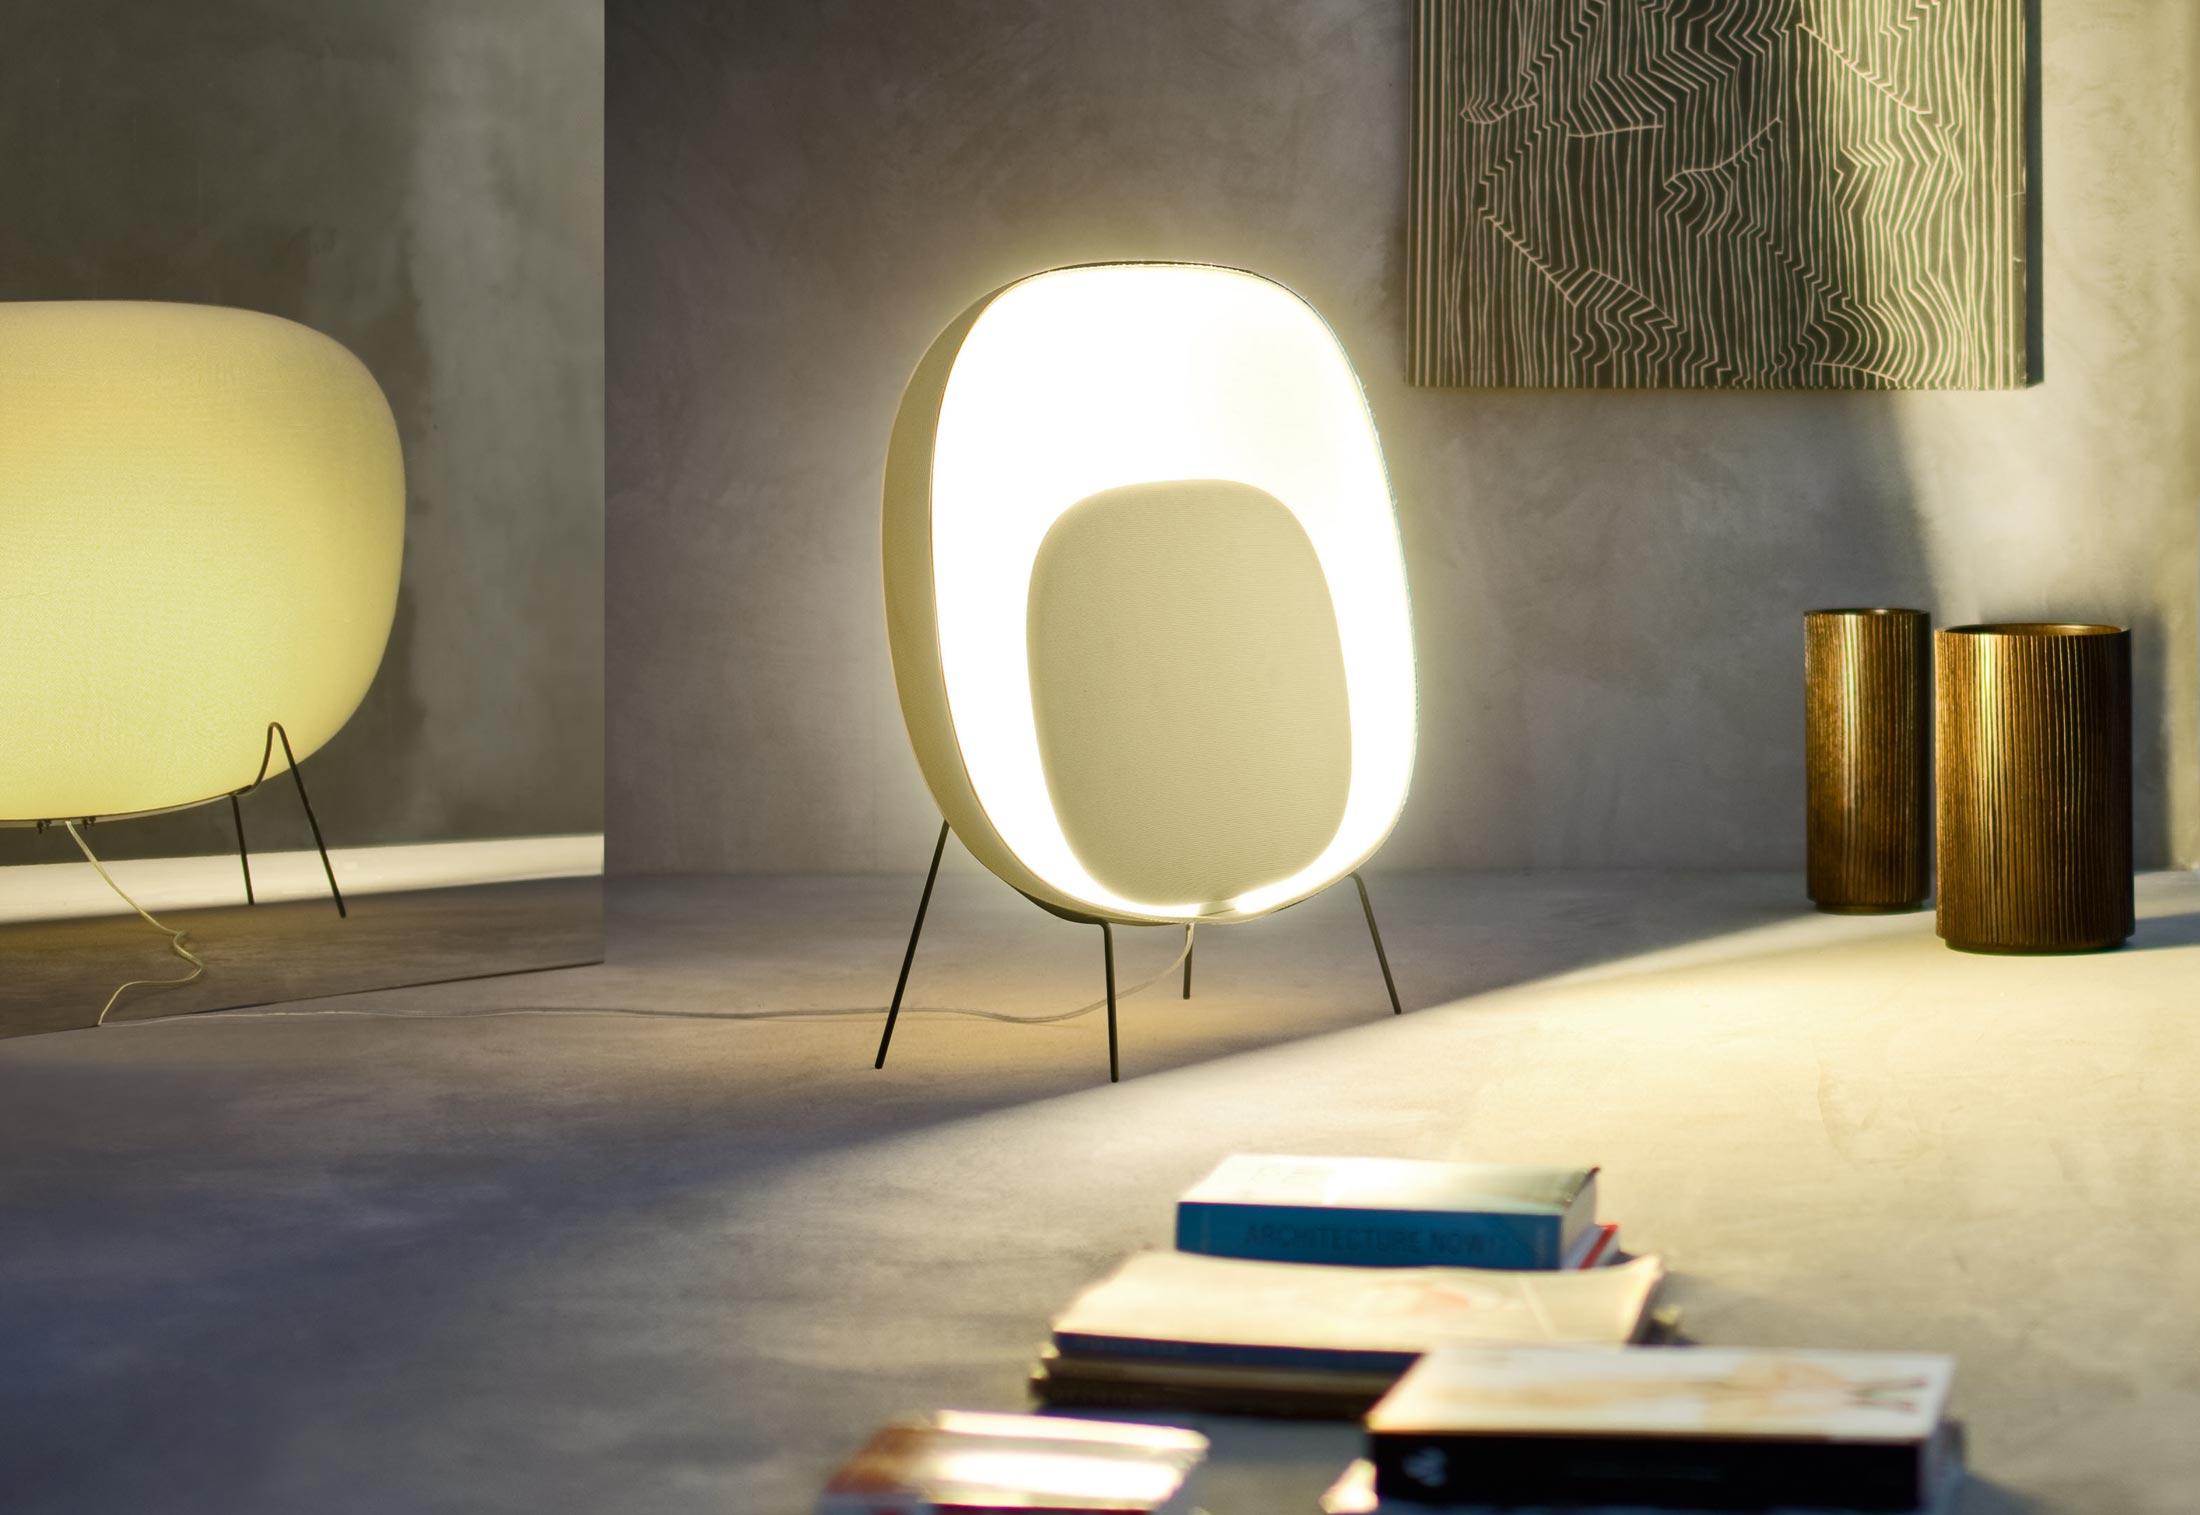 Foscarini Lampen Outlet : Foscarini lampe interesting foscarini lampe caboche tavolo